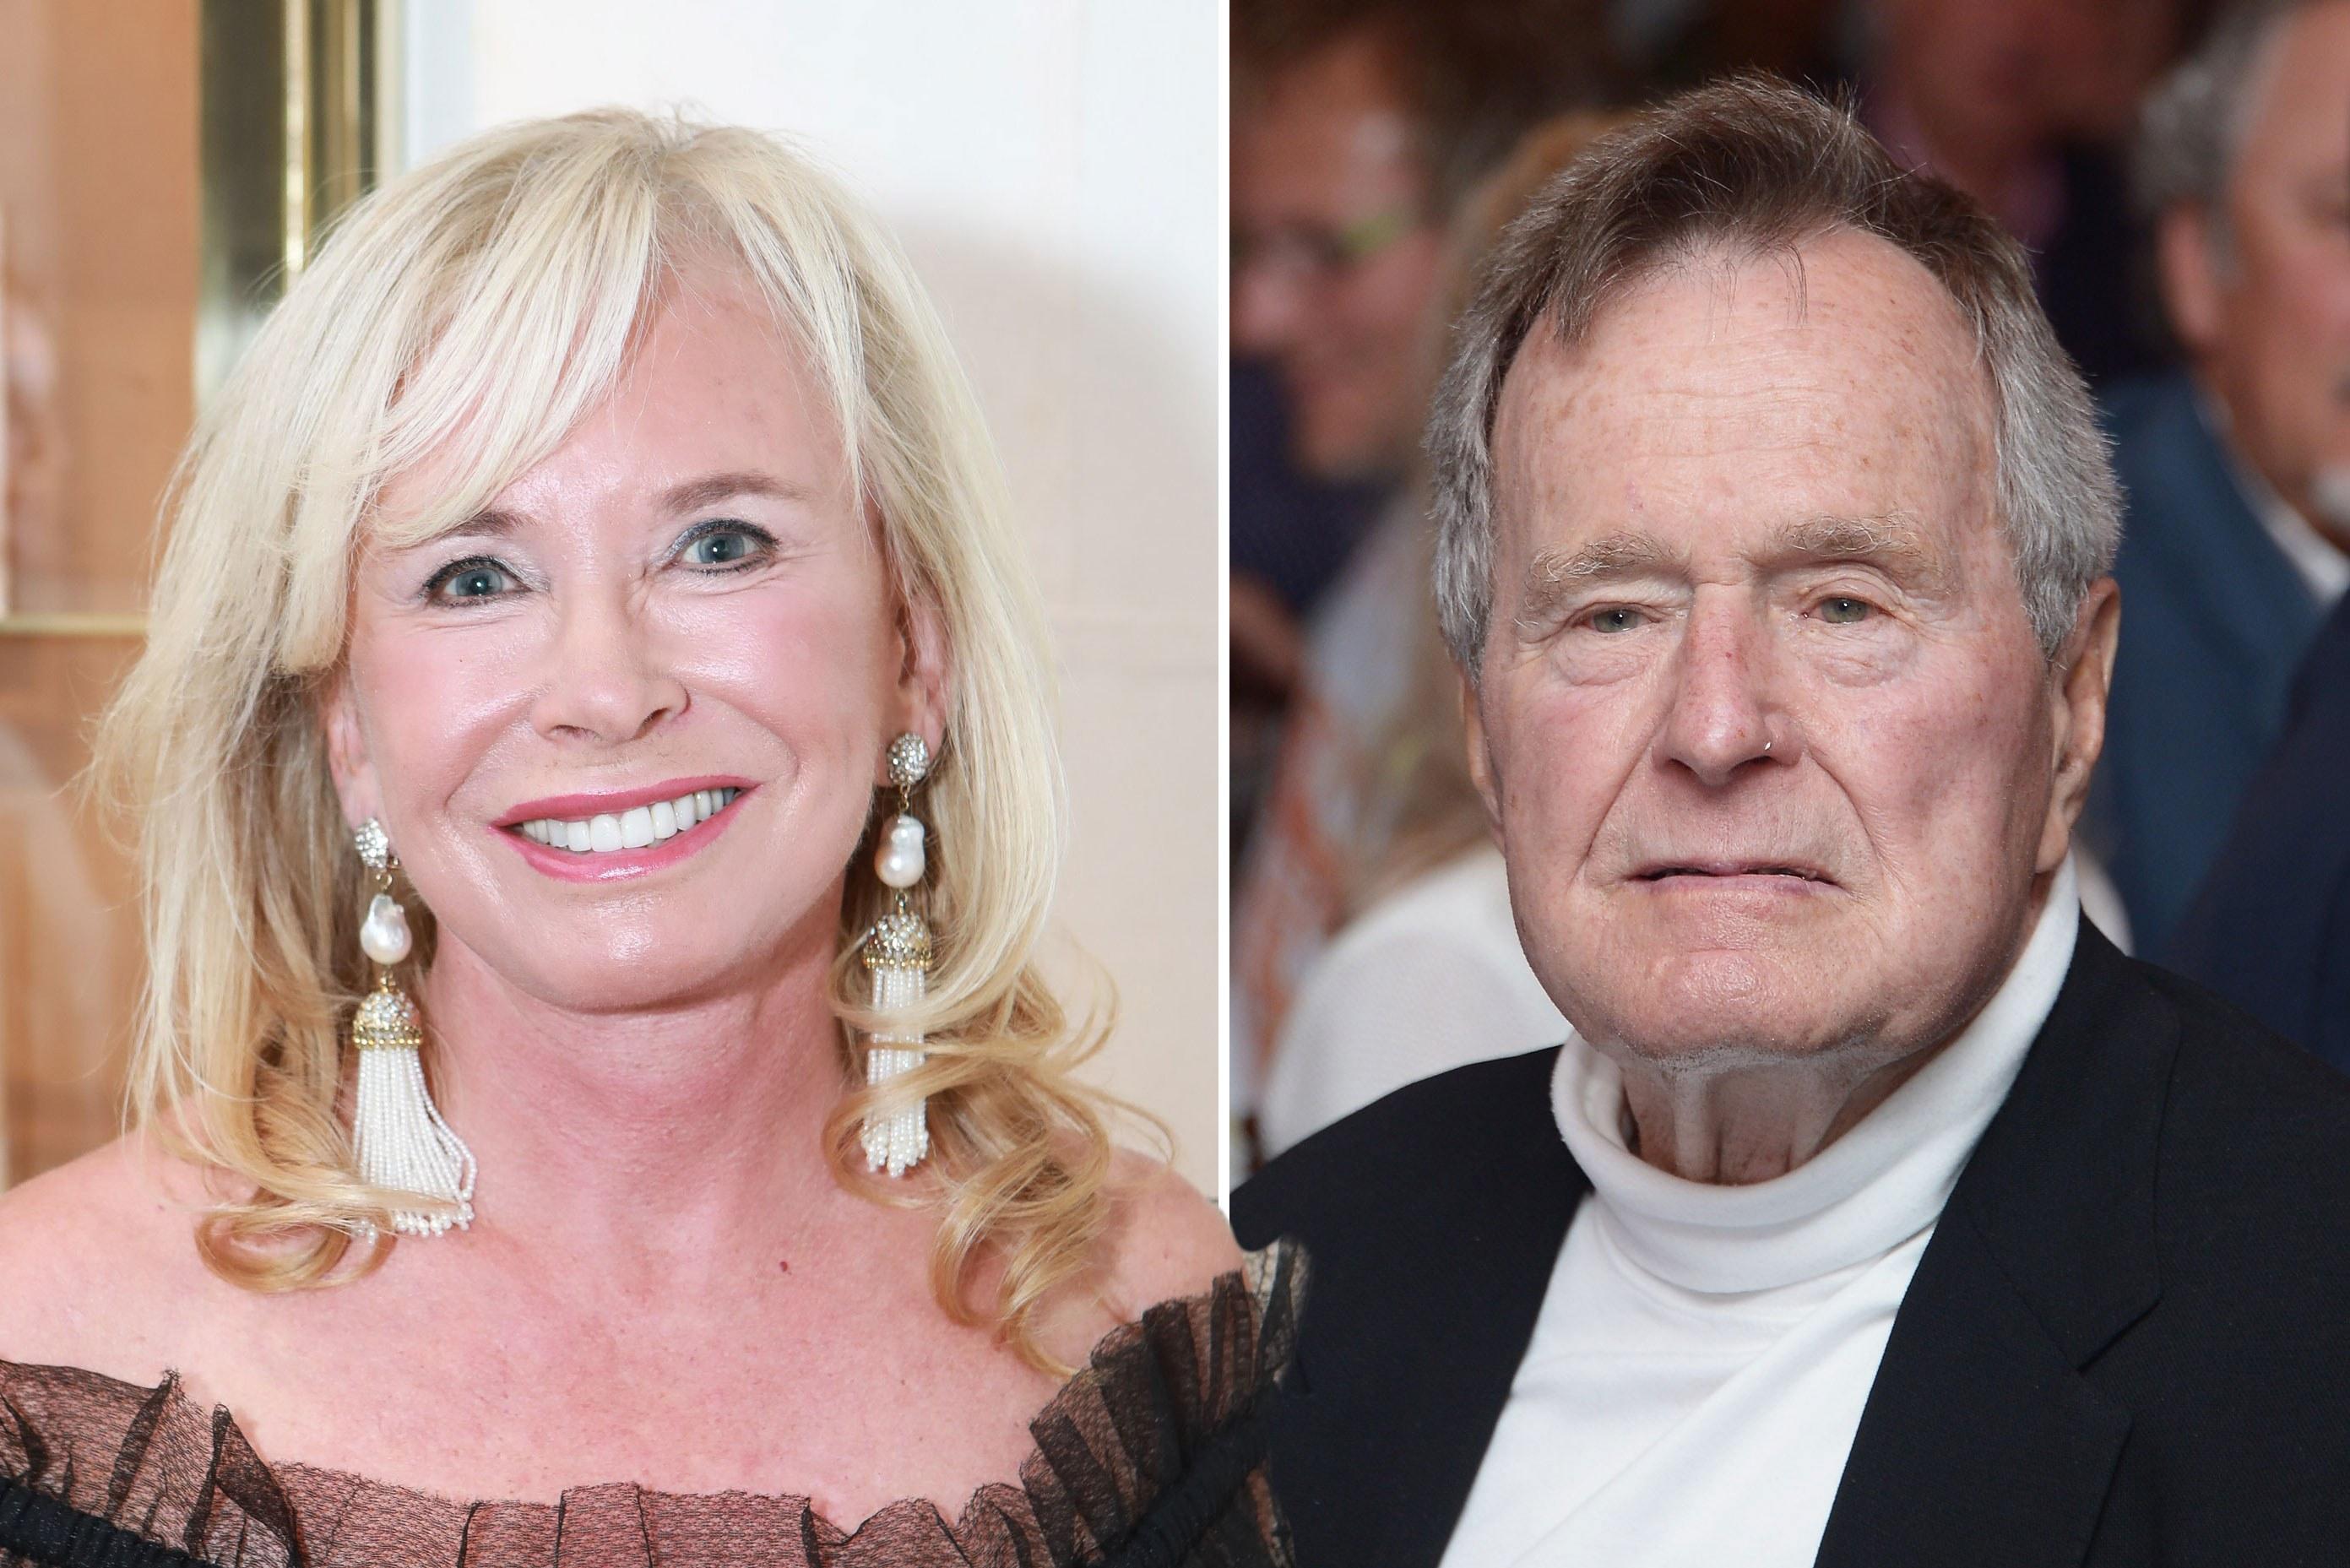 Sharon Bush wasn't invited to George H.W. Bush's funeral